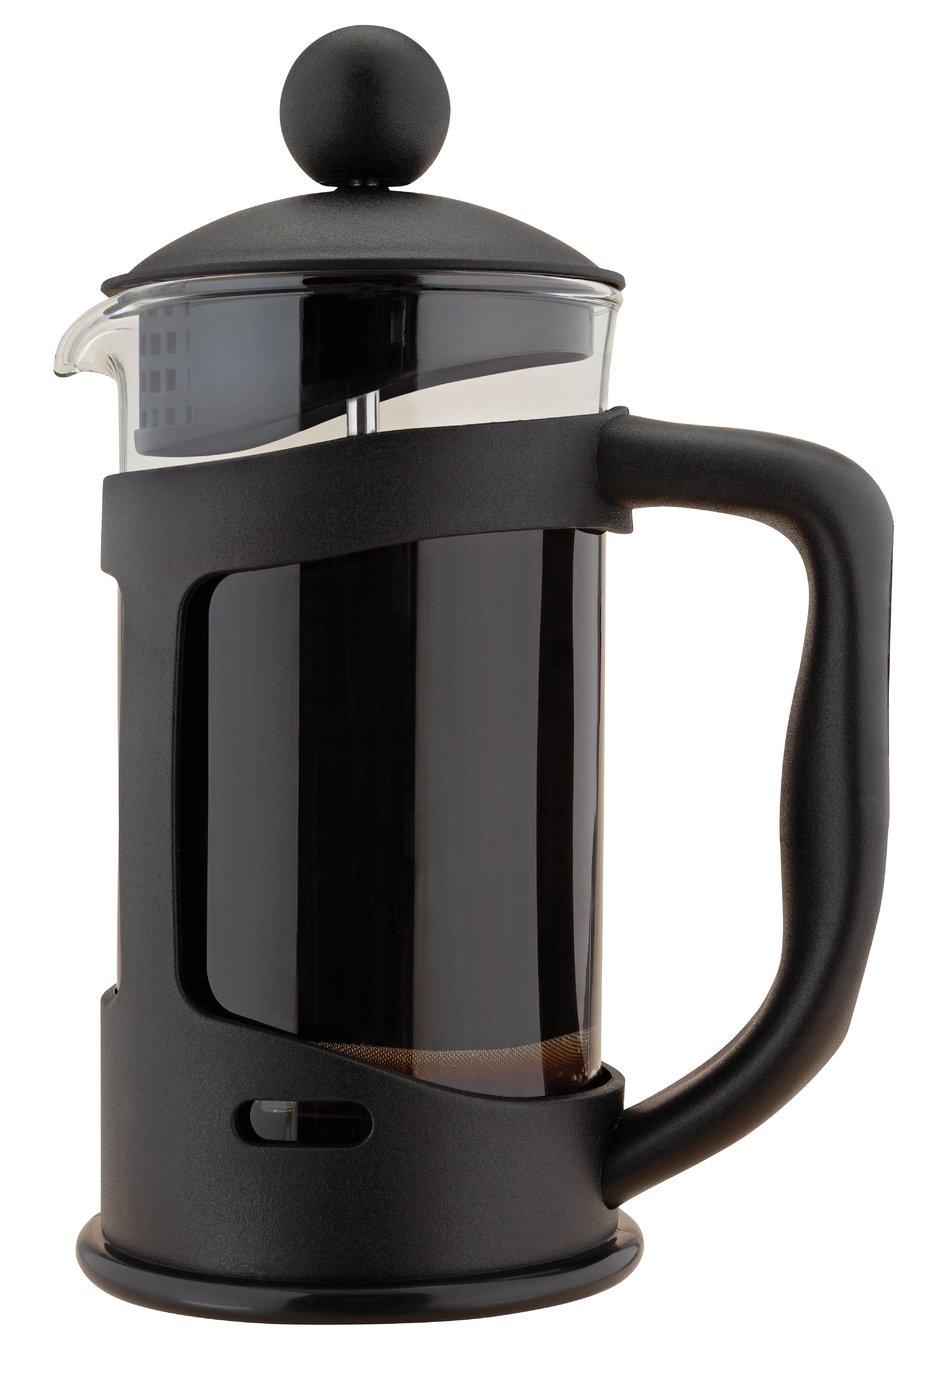 Argos Home 3 Cup Plastic Cafetiere - £4.69 / £8.64 delivered at Argos